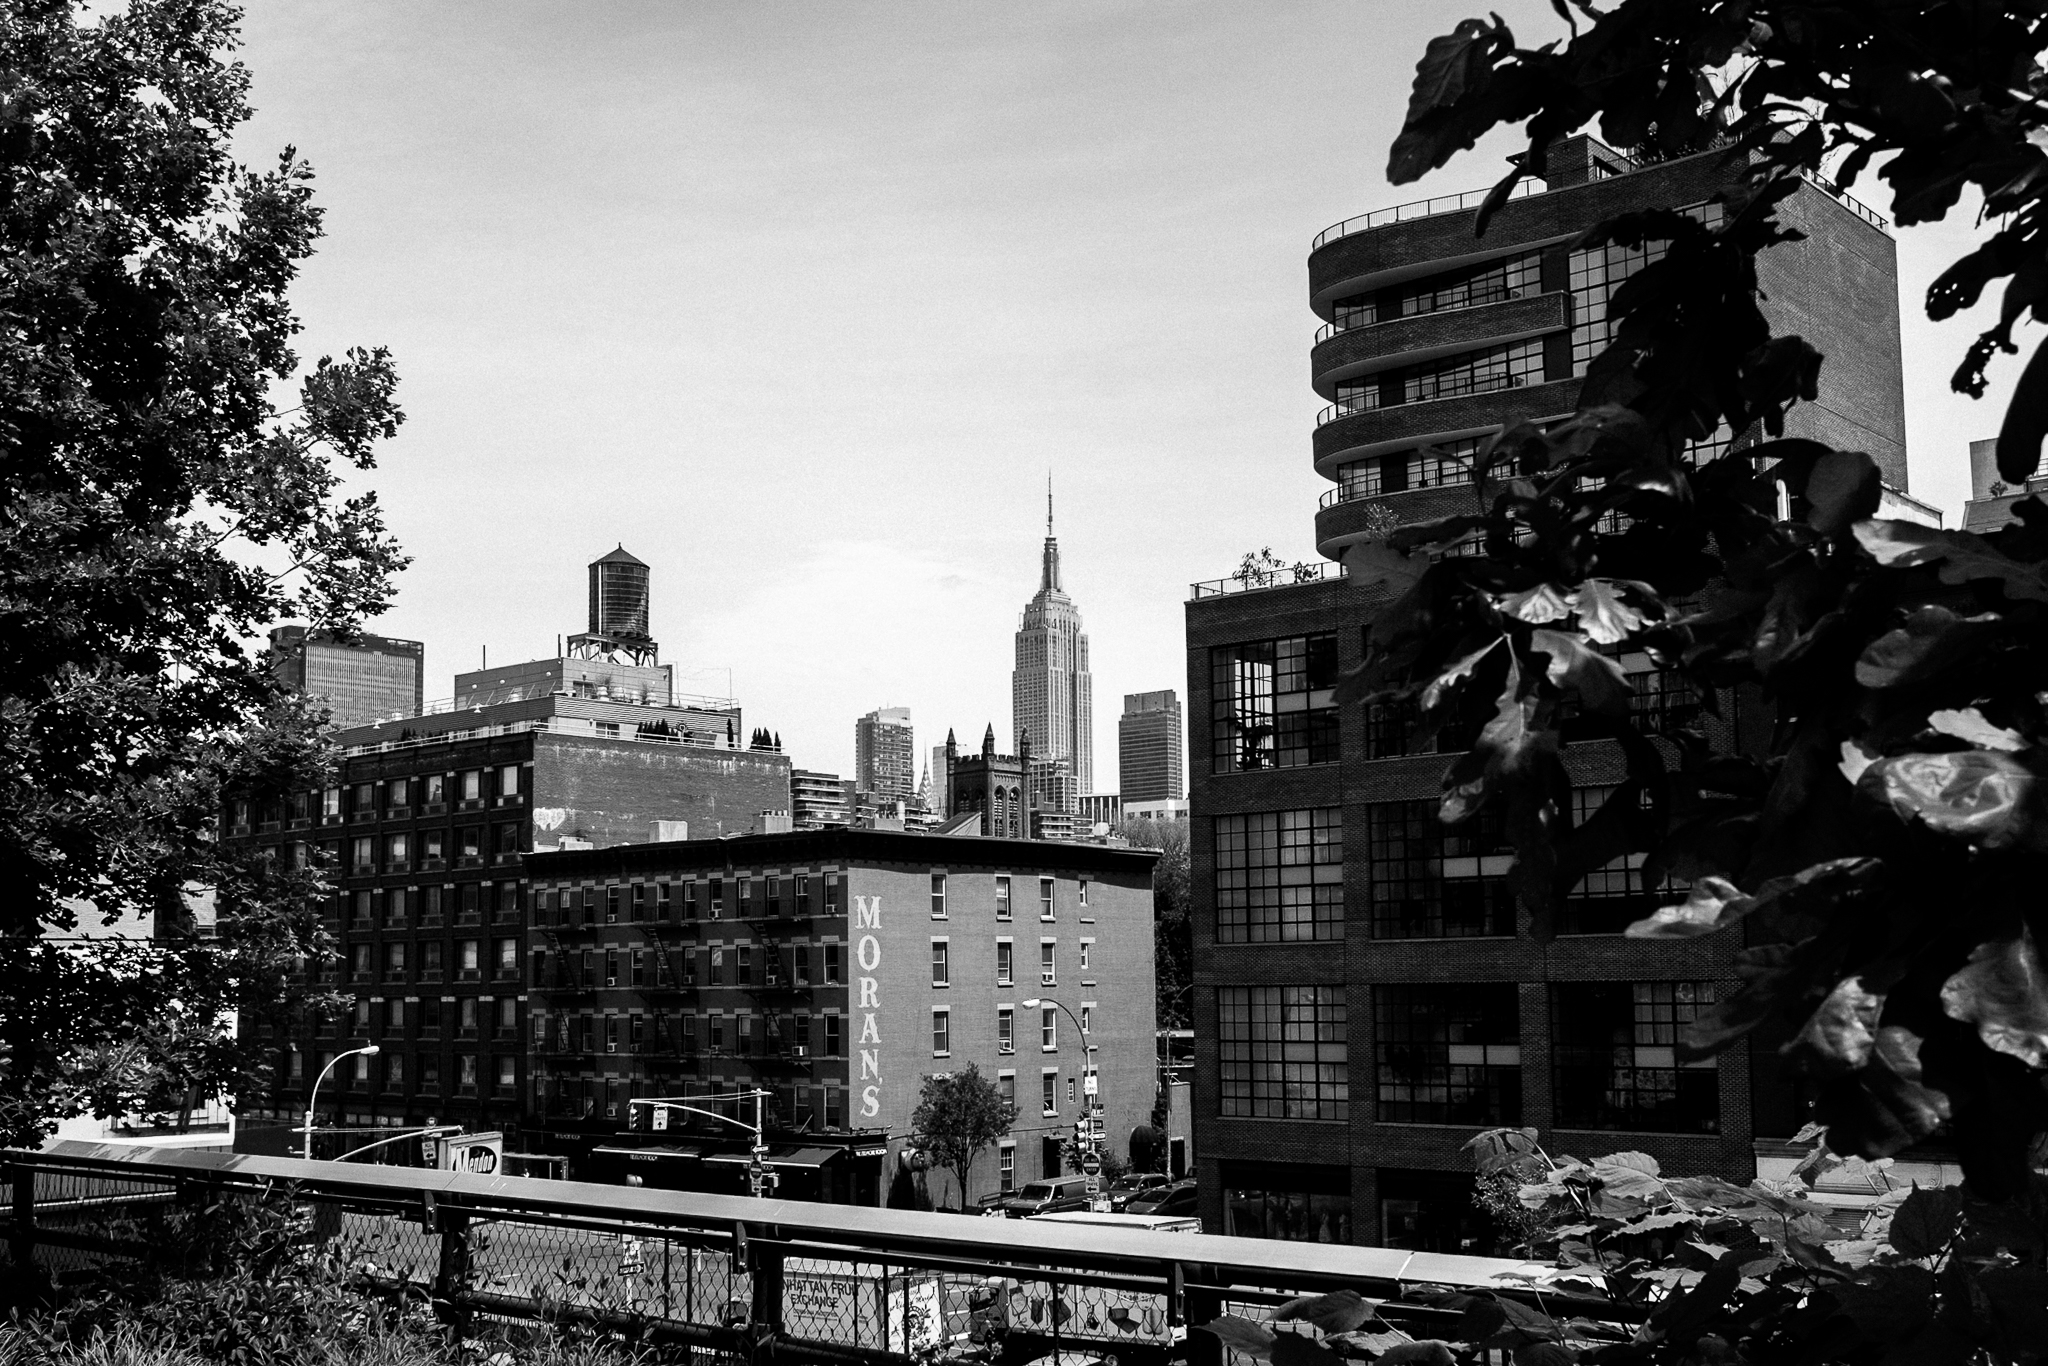 2015-05-14-NYC-2264.jpg